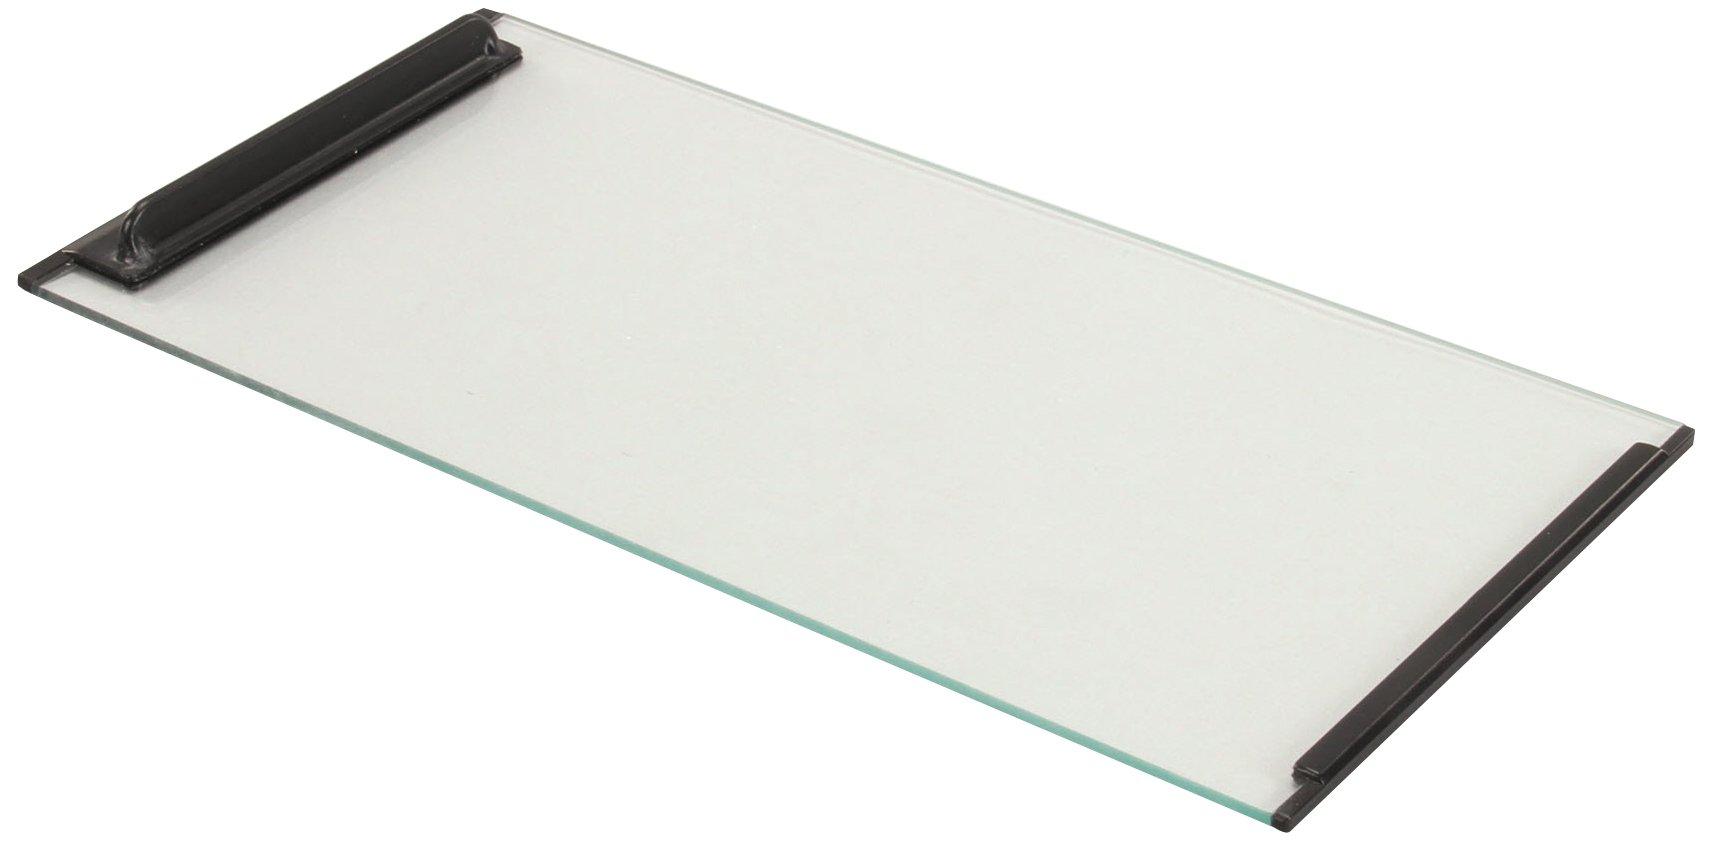 Hoshizaki 3R5019G08 Slide Glass, 172mm by 363mm